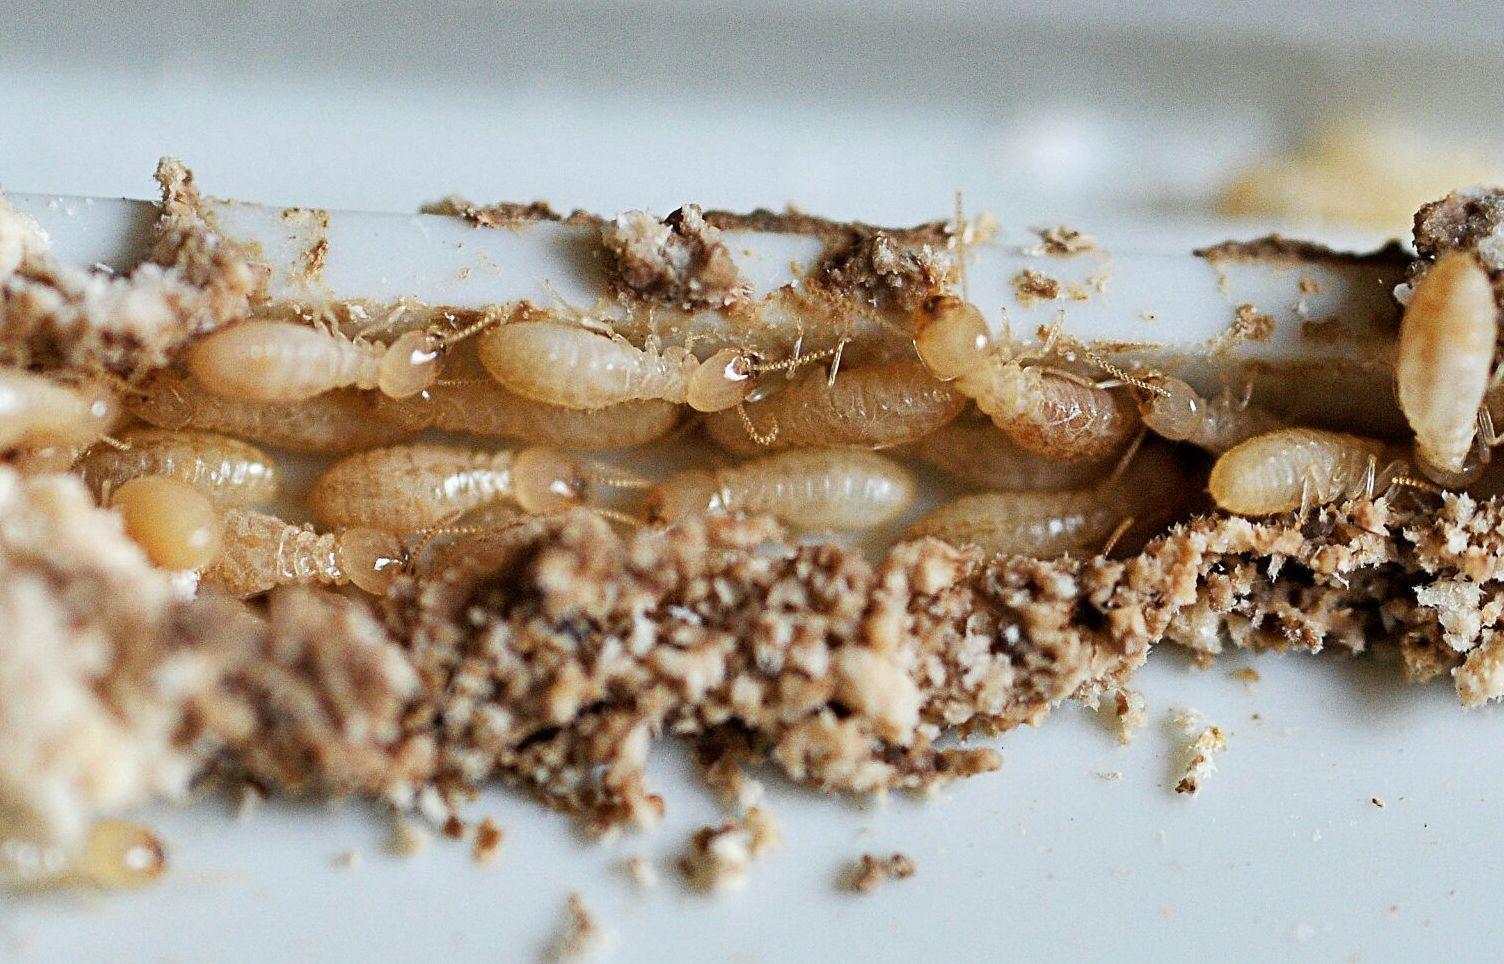 Expertos en eliminación de termitas en Castellón